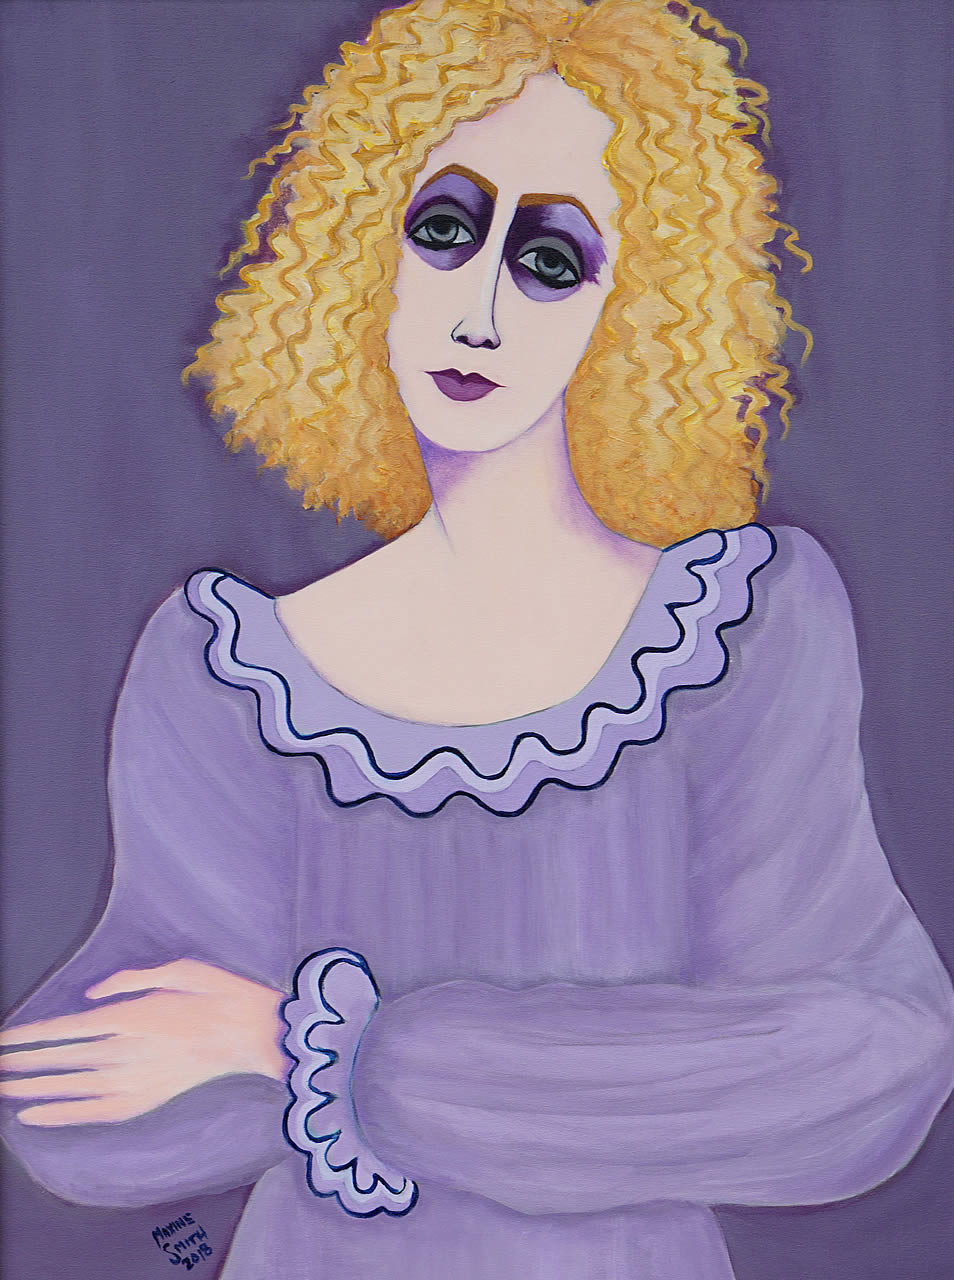 Woman in Peasant Blouse